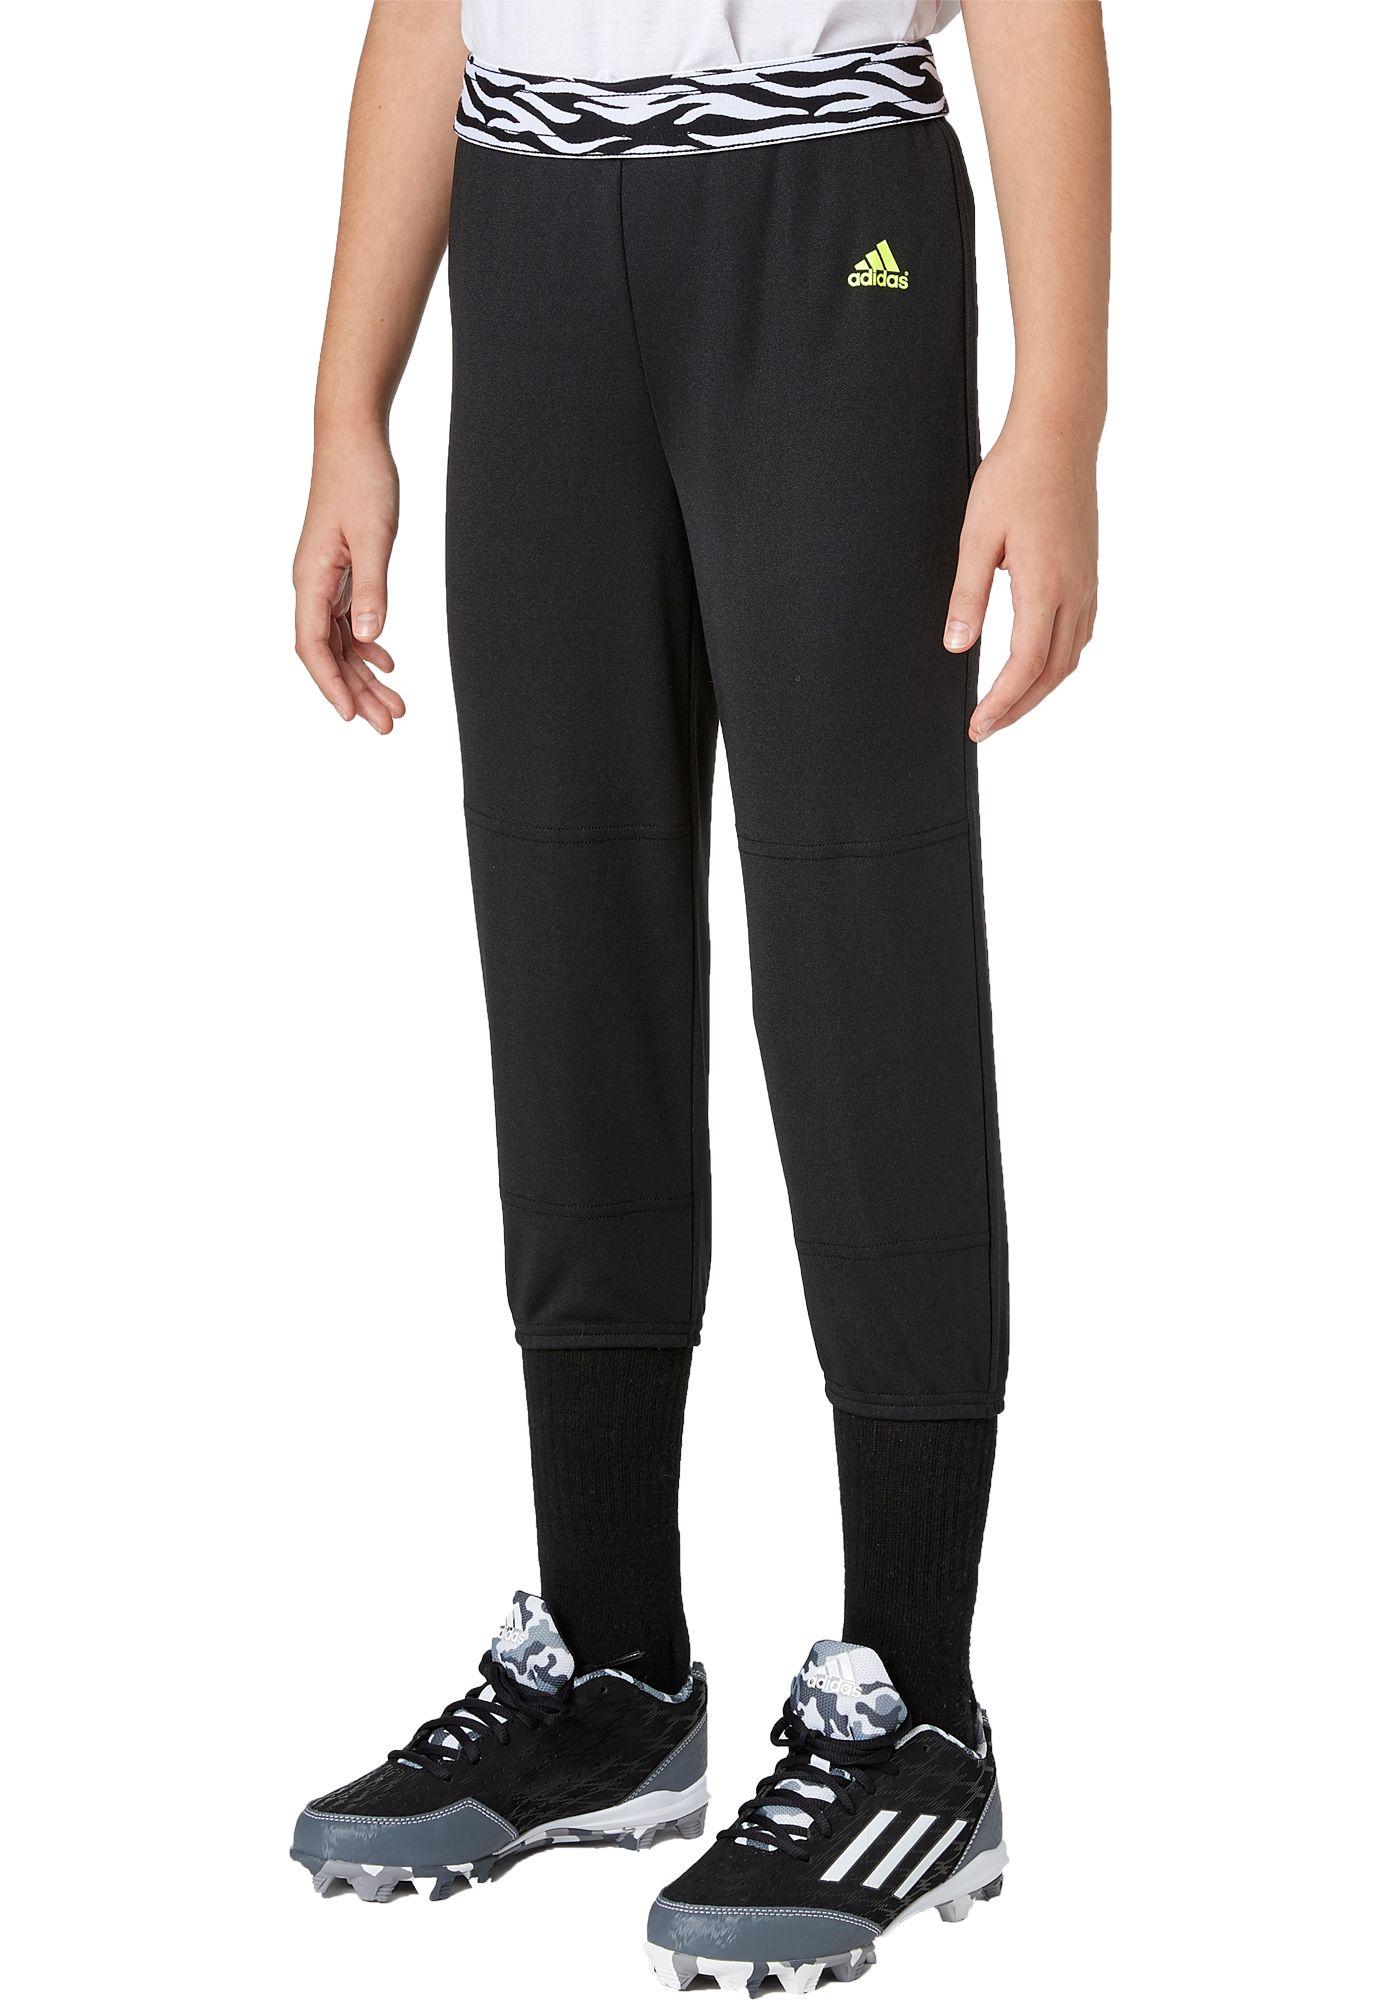 adidas Girls' Destiny Printed Waist Softball Pants